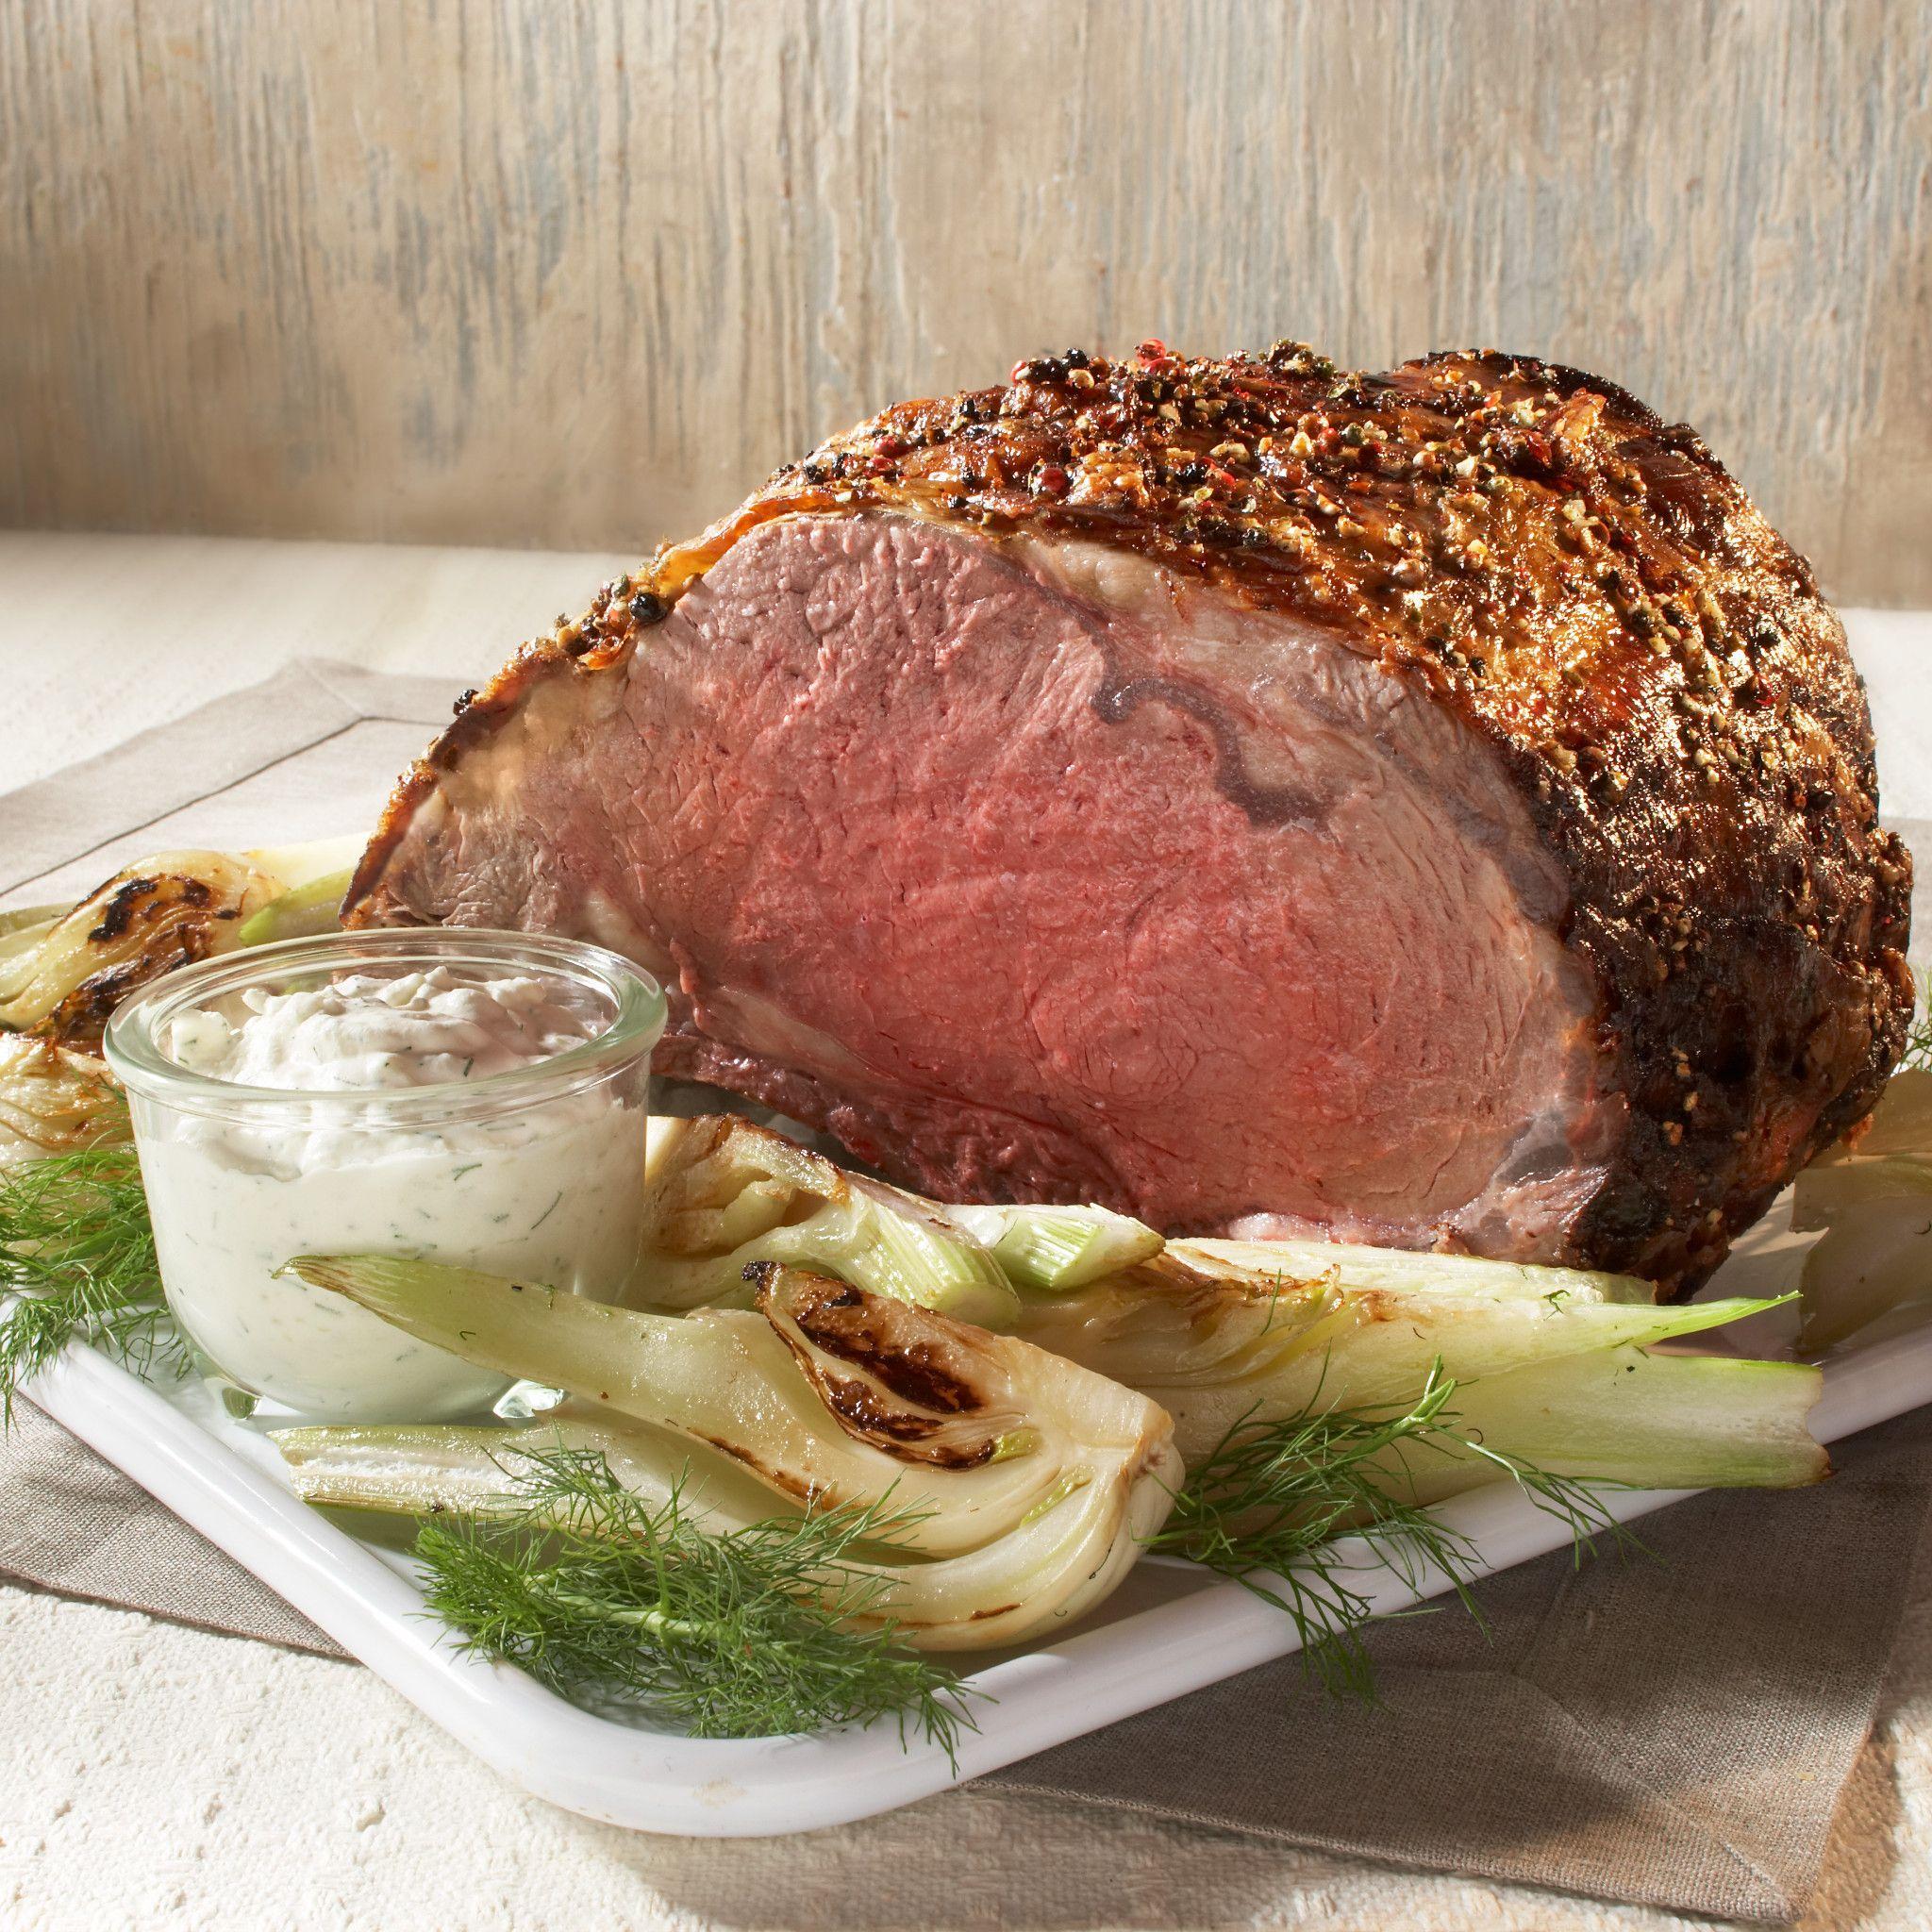 Prime rib with horseradish sauce. Photo credit: Iowa Beef Industry Council